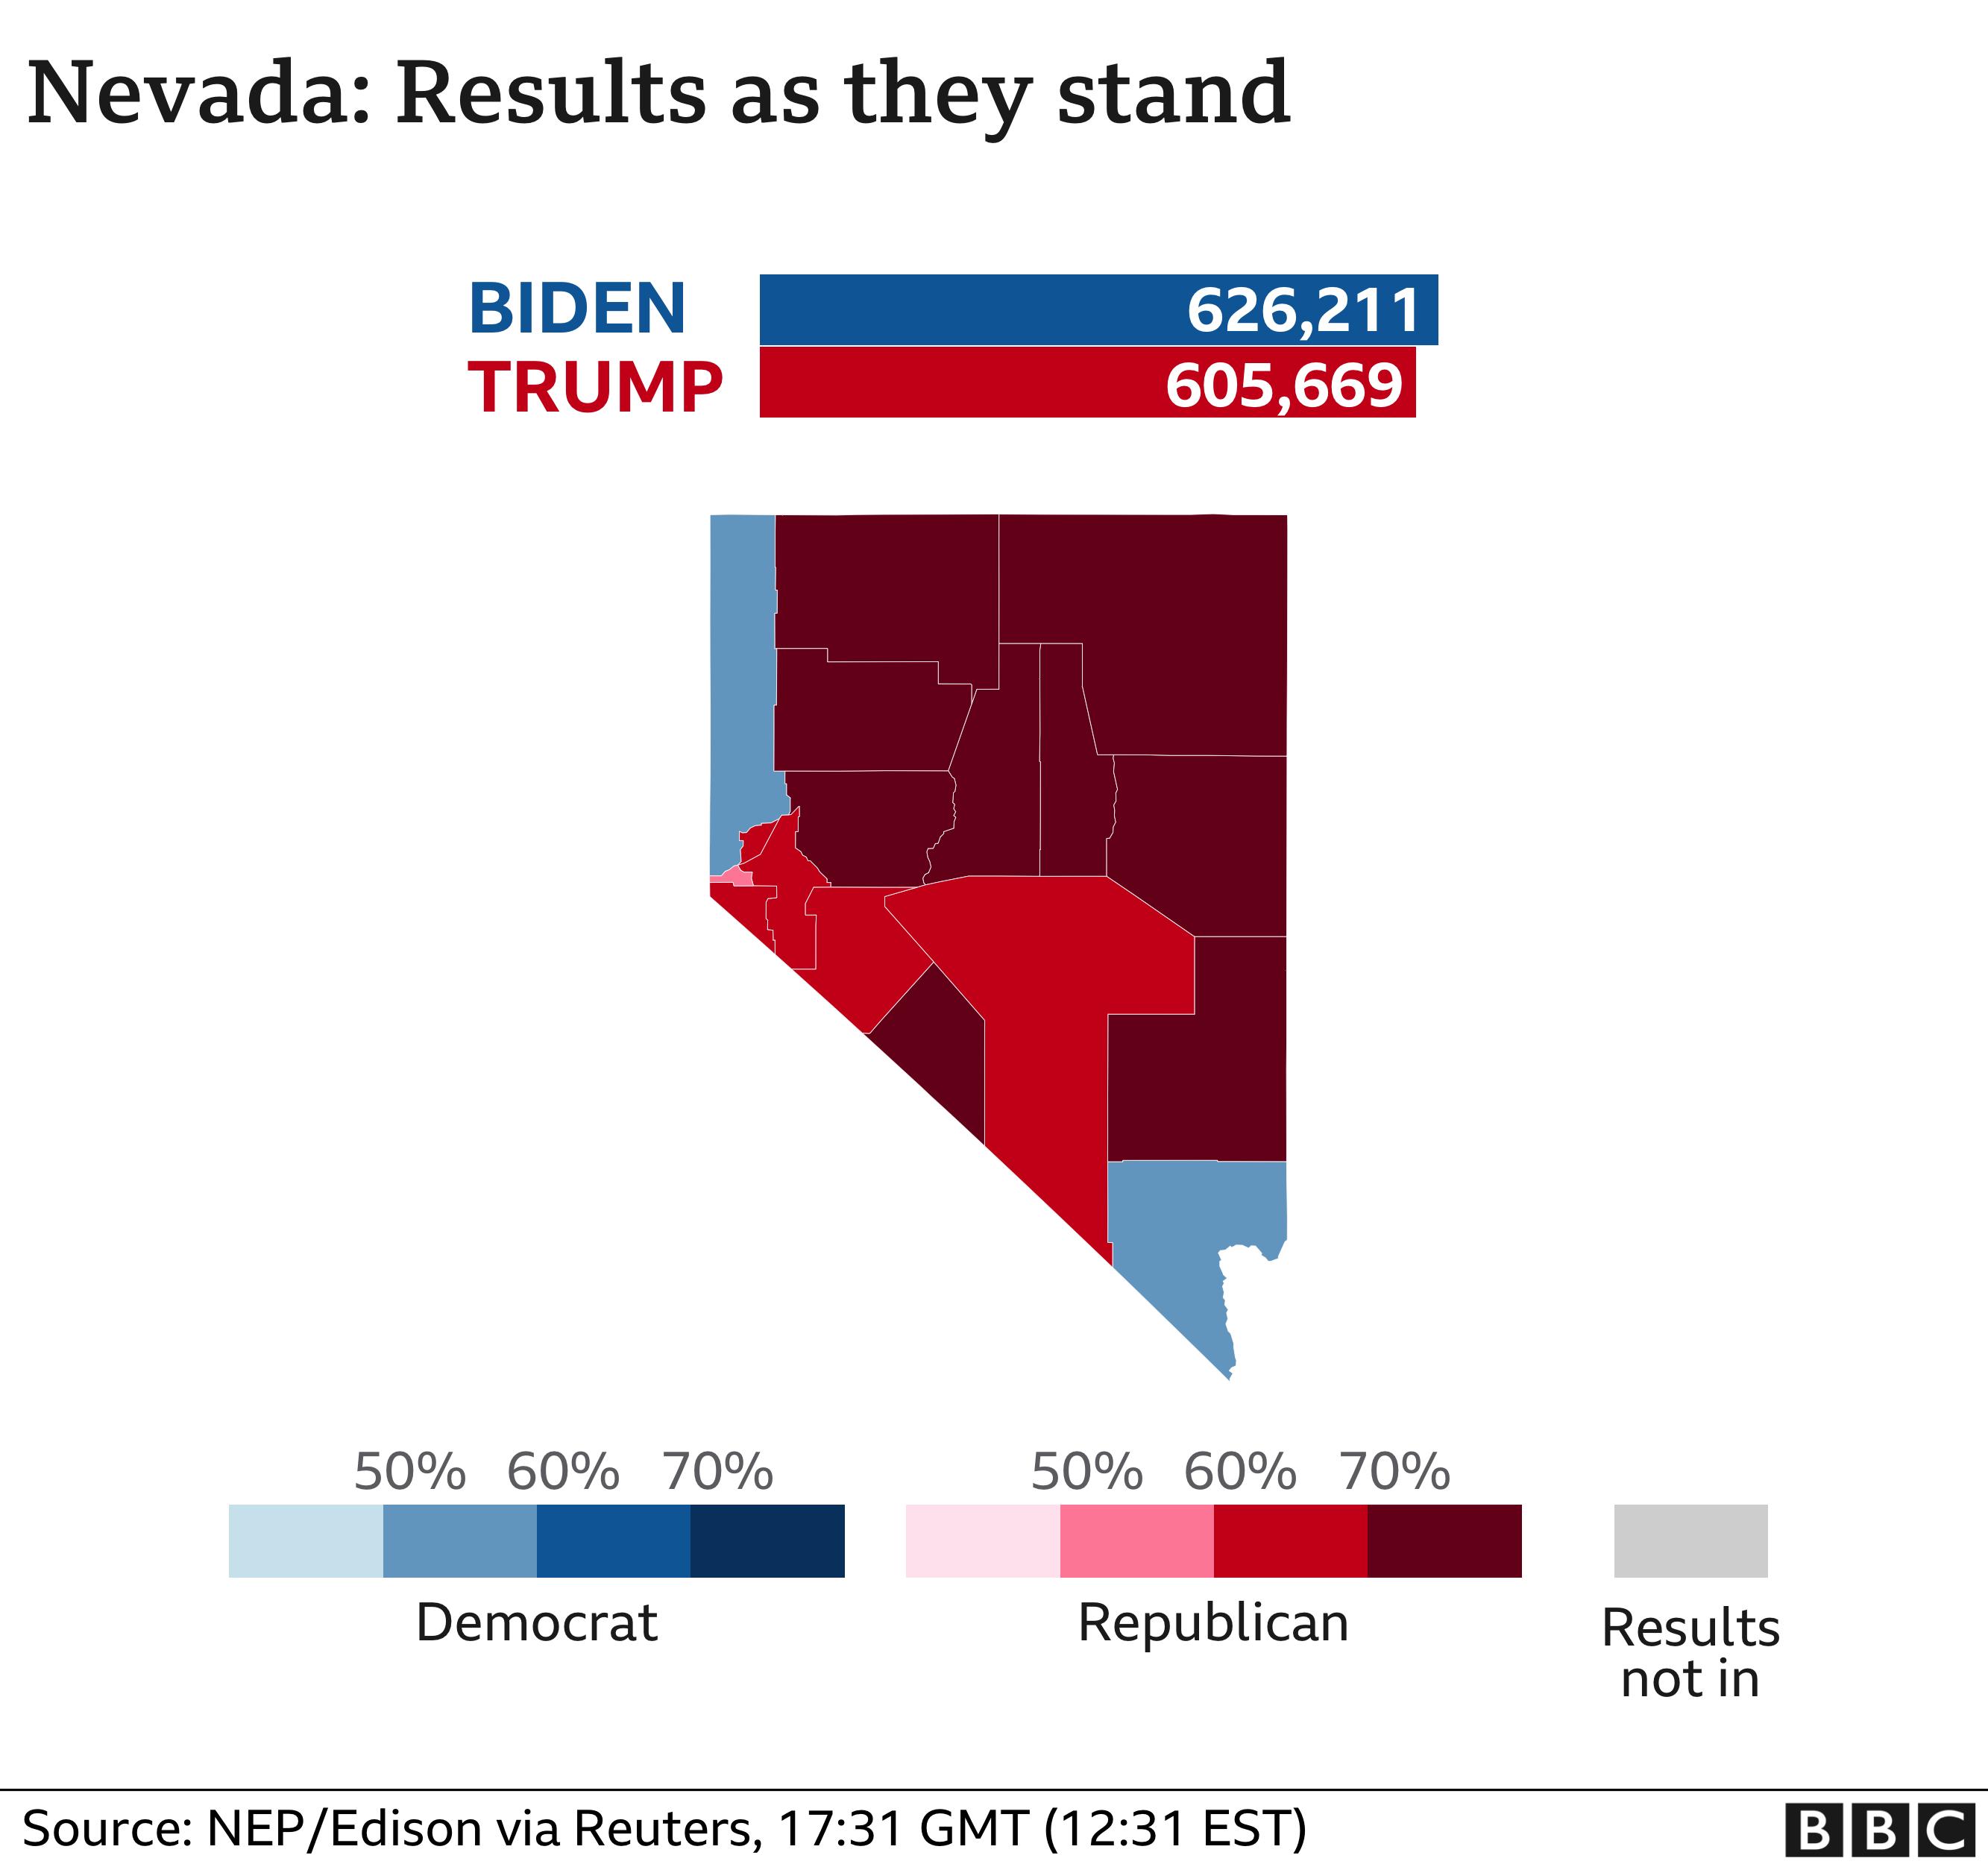 Nevada graphic